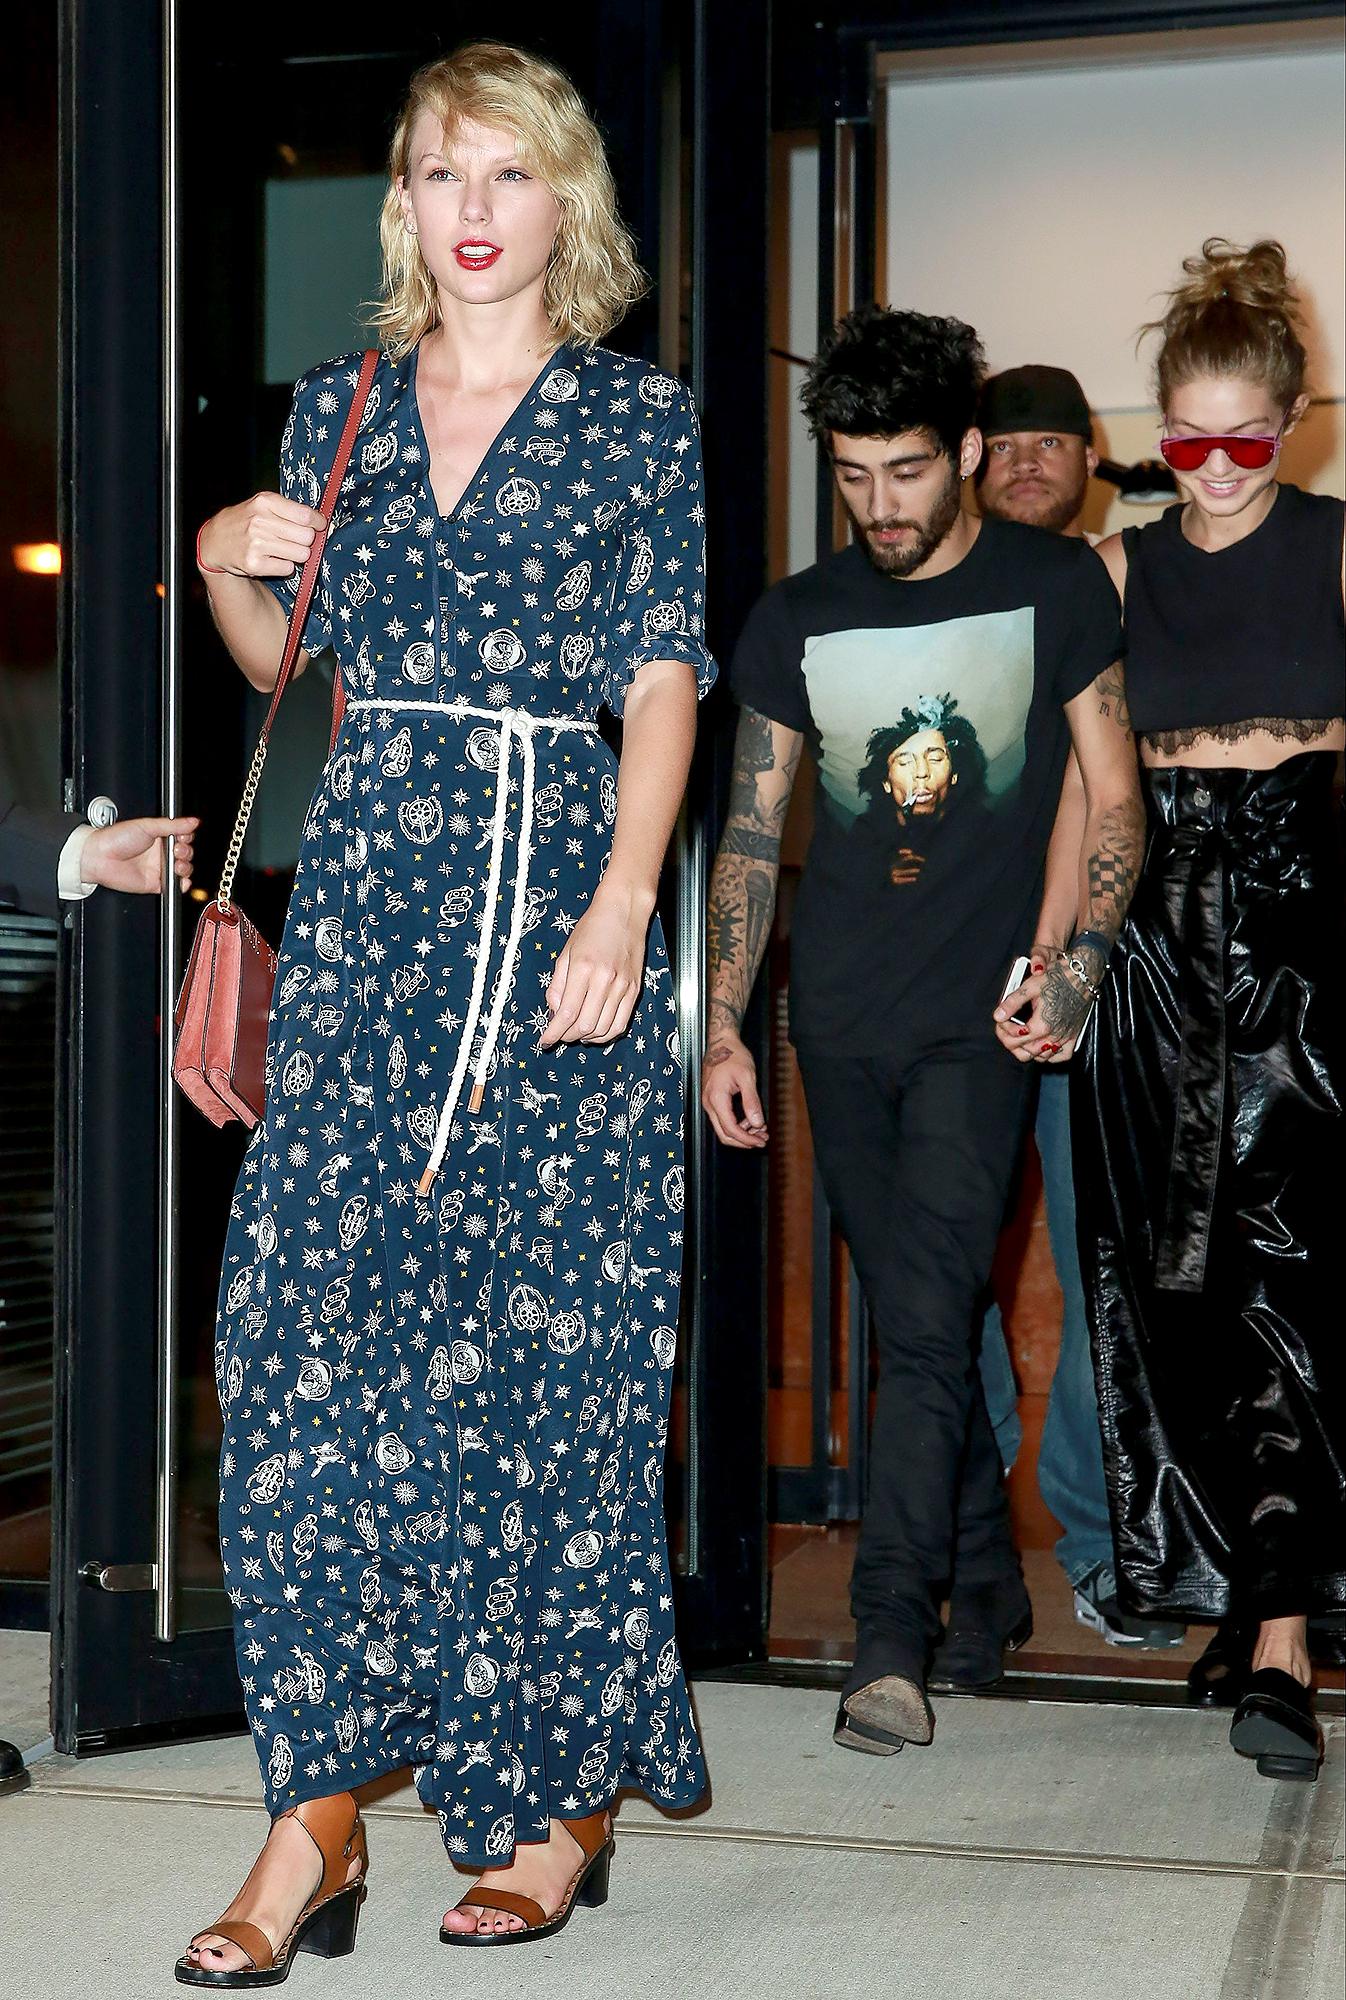 Taylor Swift Thinks Pregnant Gigi Hadid and Zayn Malik Are a Good Match 2